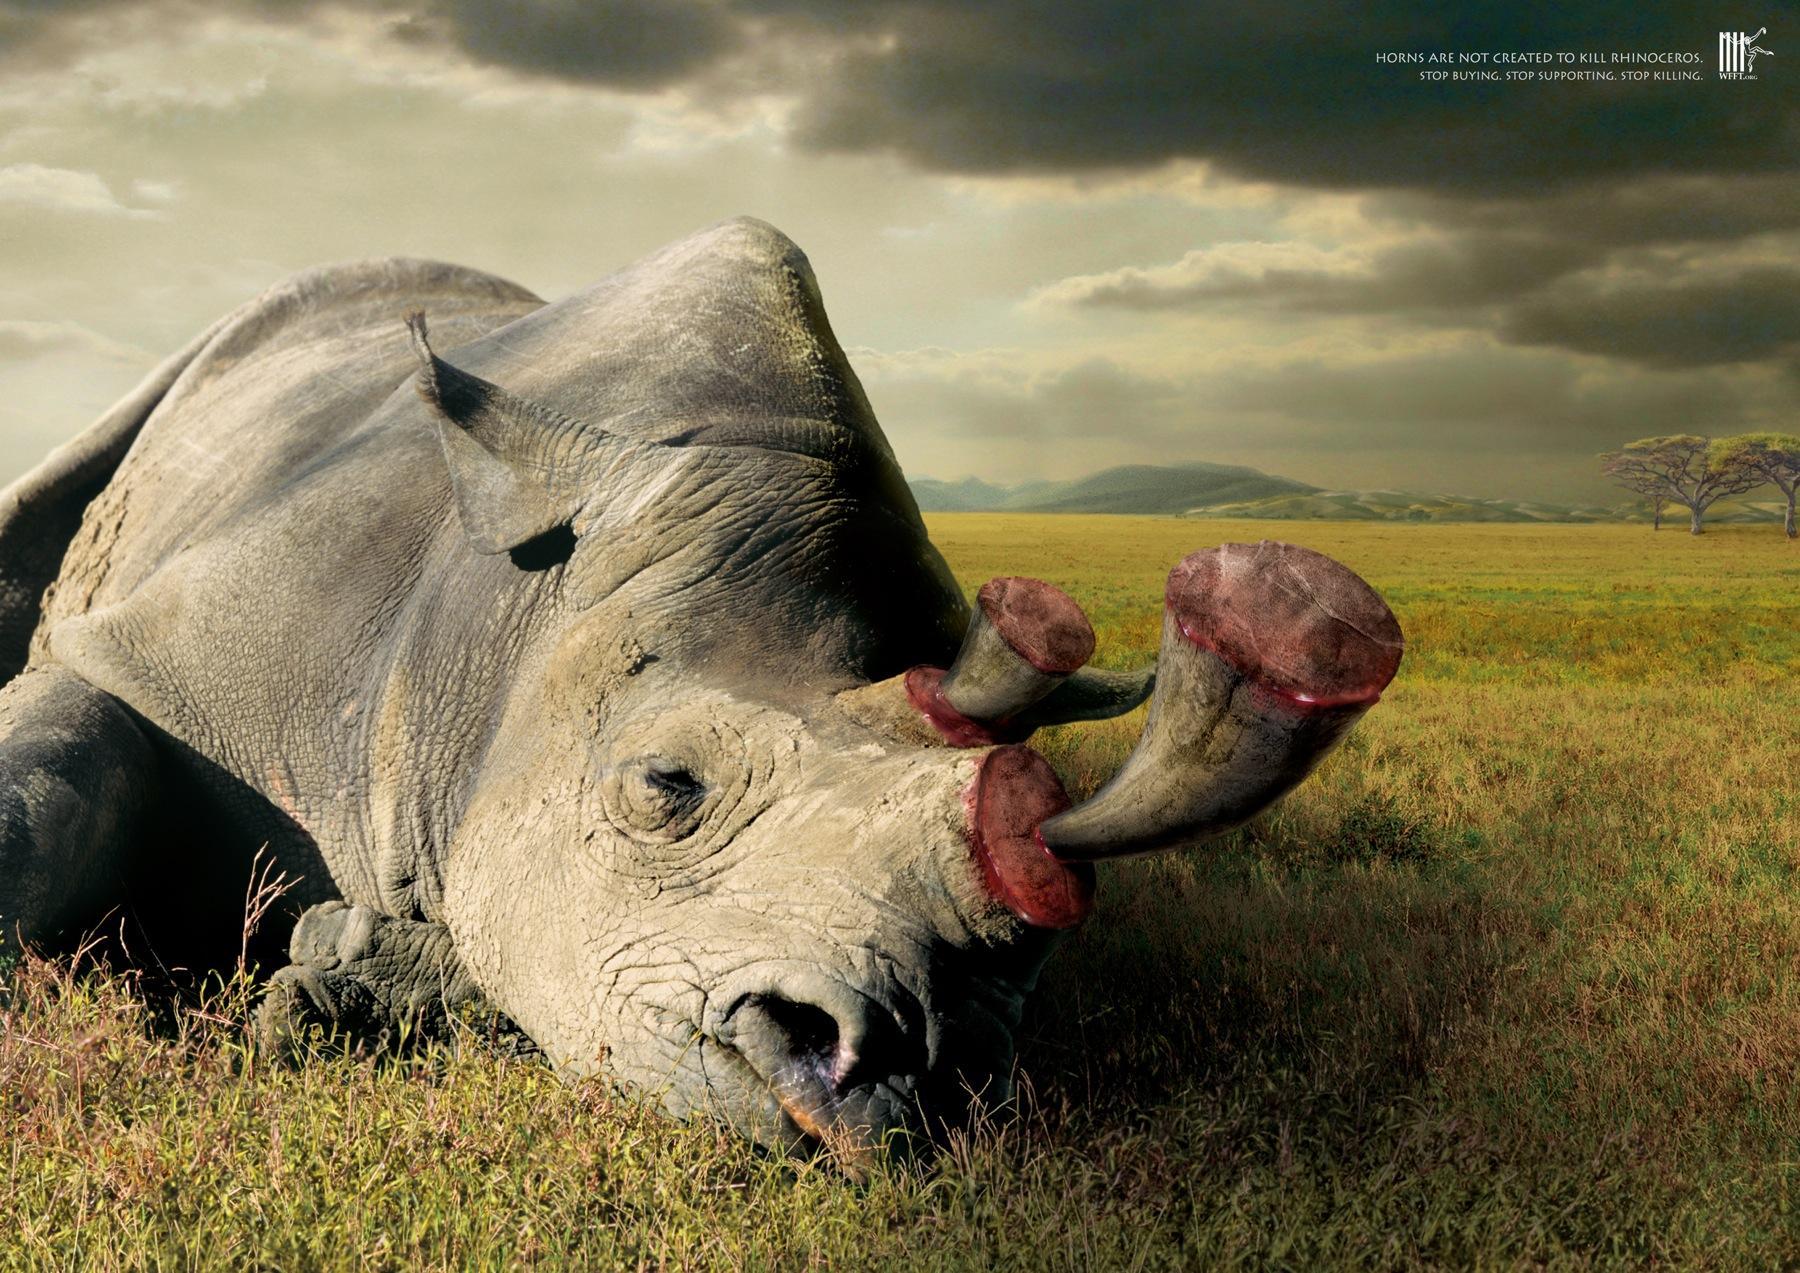 Wildlife Friend Foundation Thailand Print Ad -  Horns